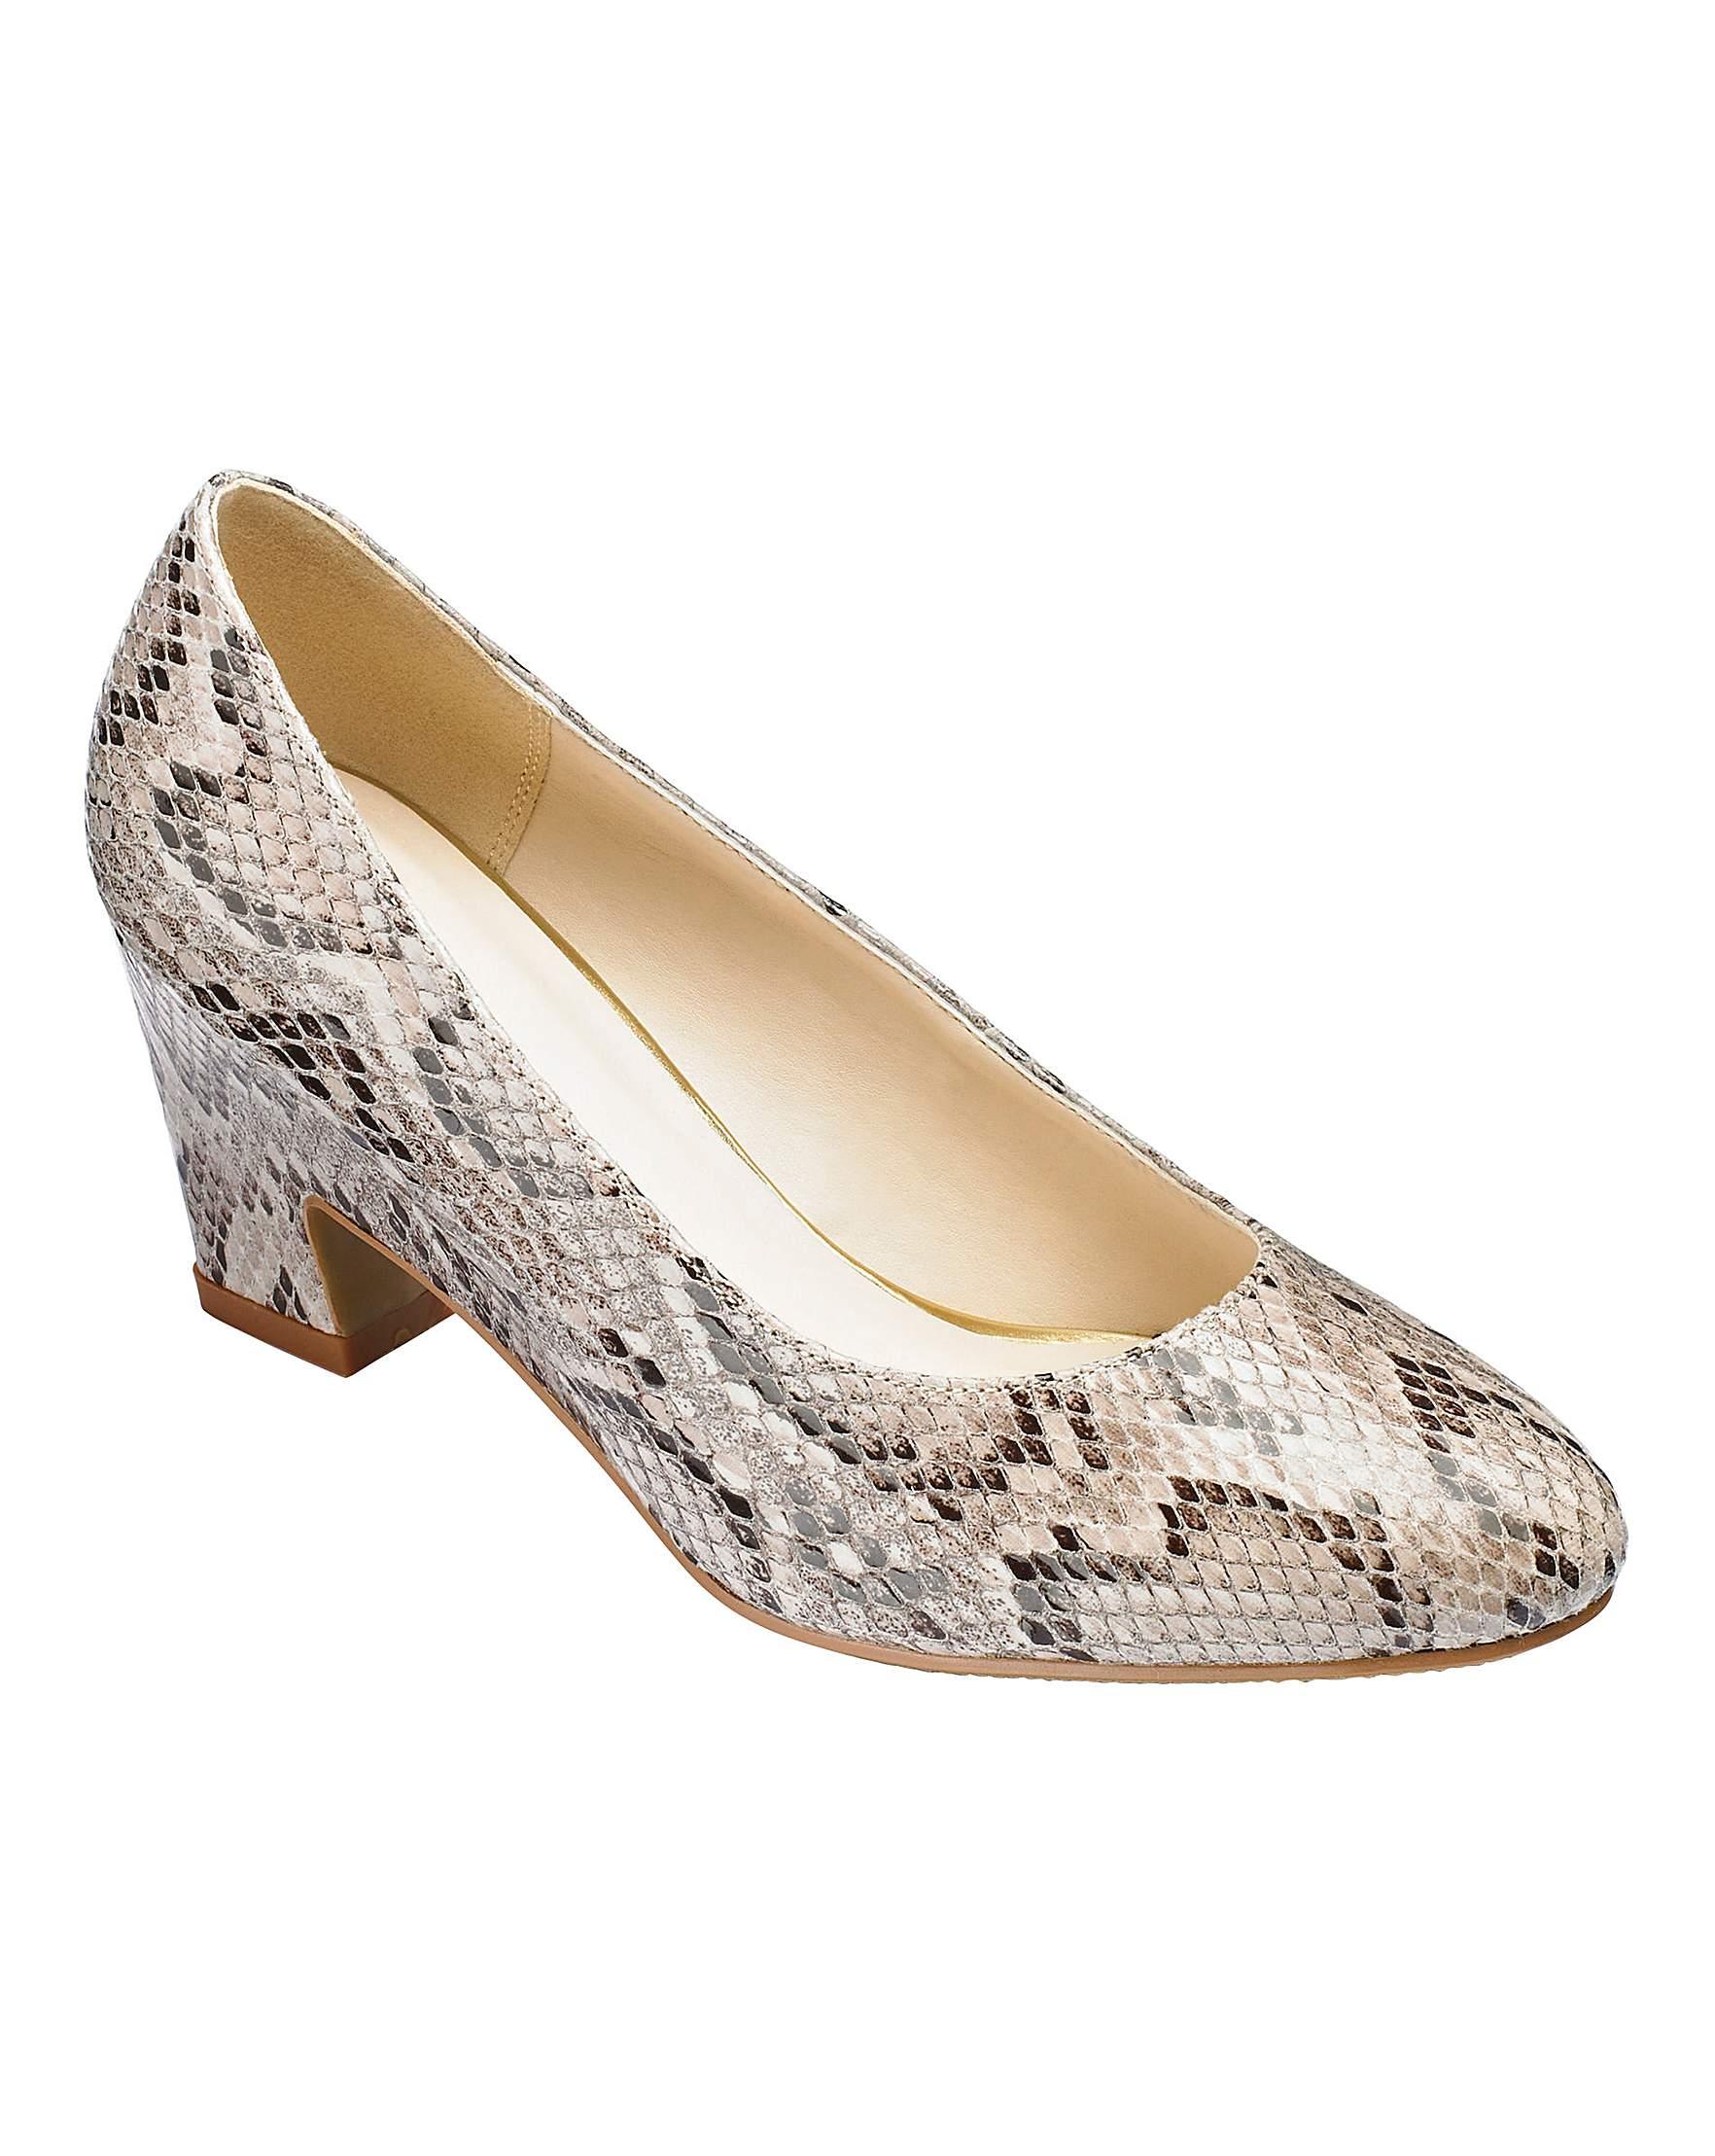 Discount Heavenly Soles Court Shoes Wide E Fit hot sale